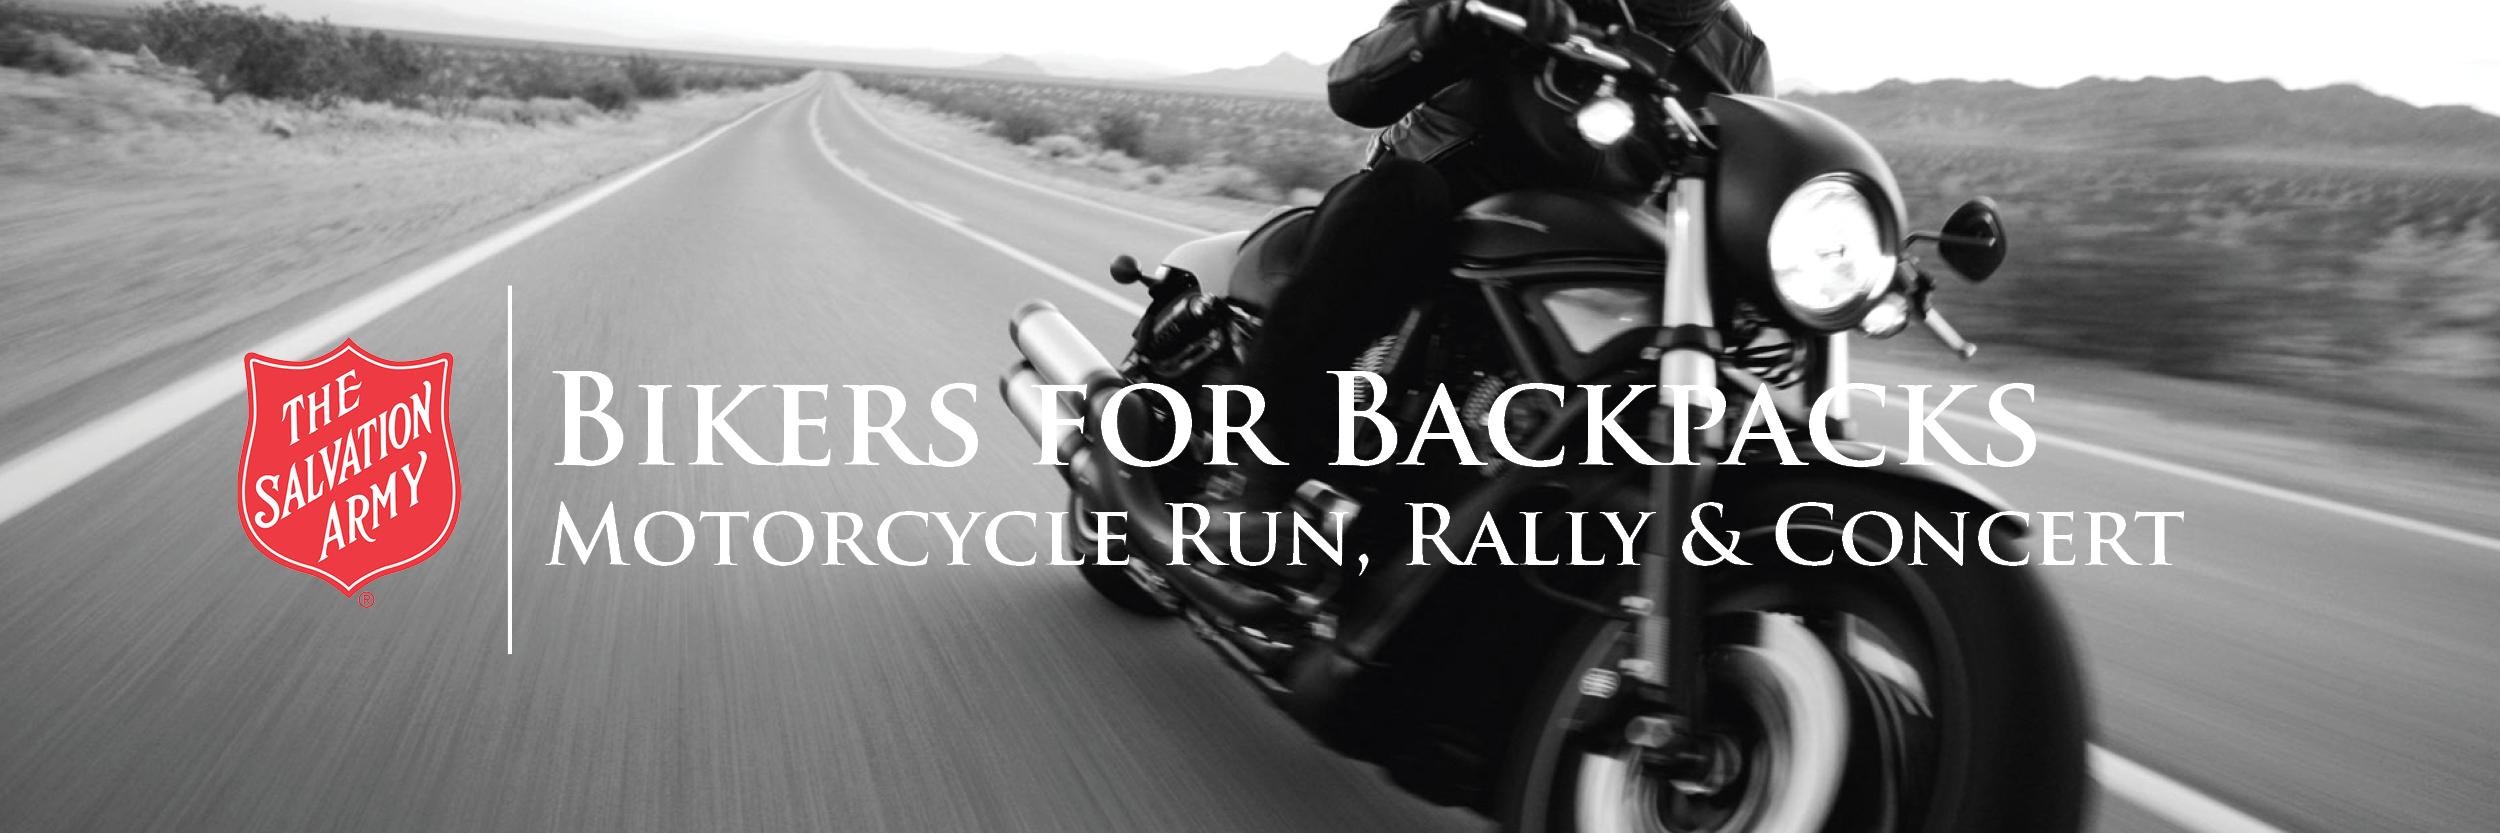 Bikers for Backpacks